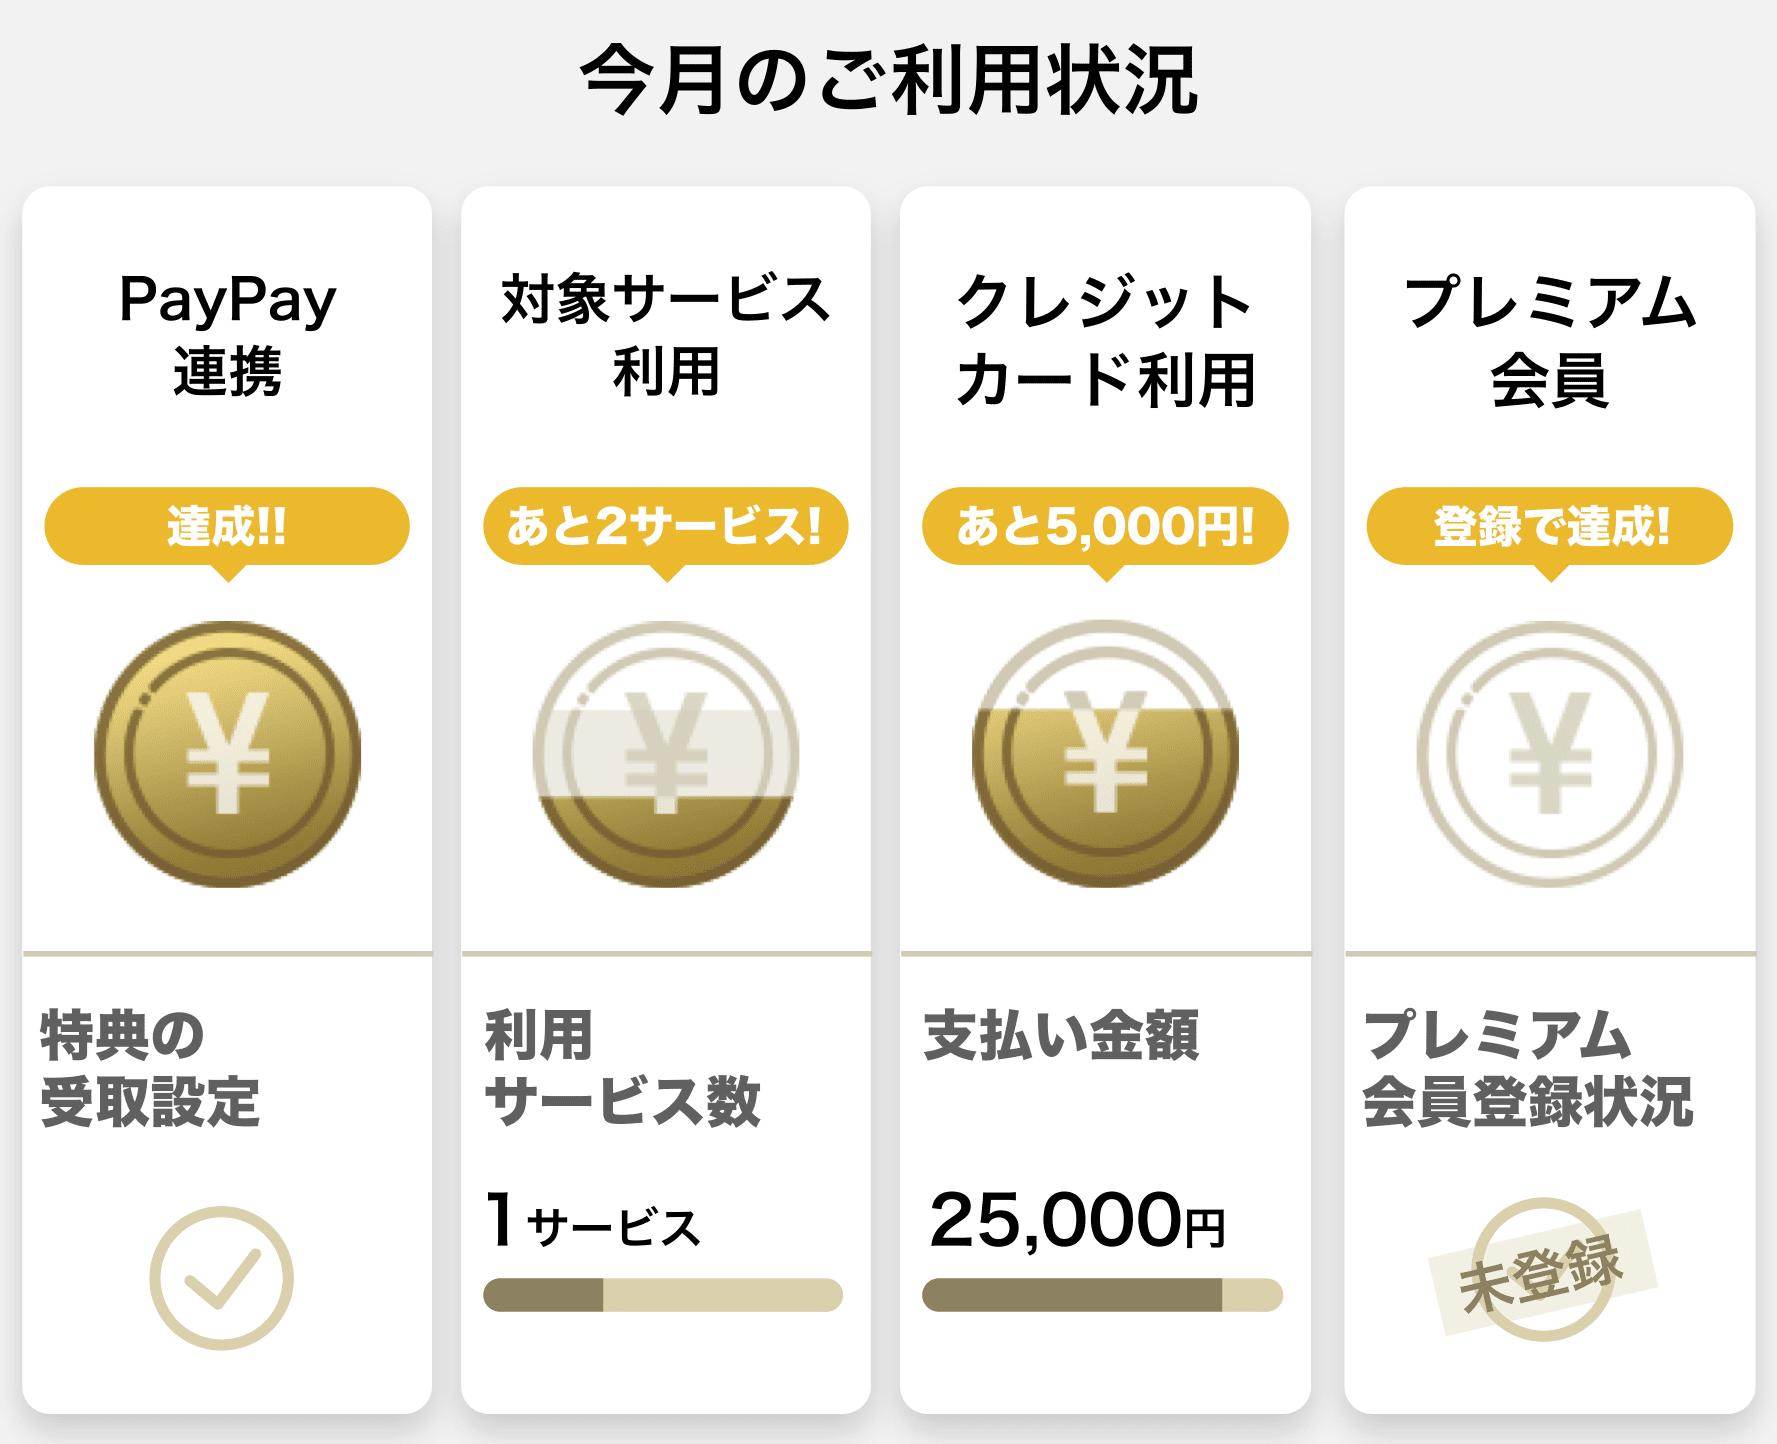 PayPaySTEPが拡充へ。日曜日はソフバンユーザーじゃなくても+5%。Yahoo!ショッピング、PayPayモールが多少お得に。10/1~。